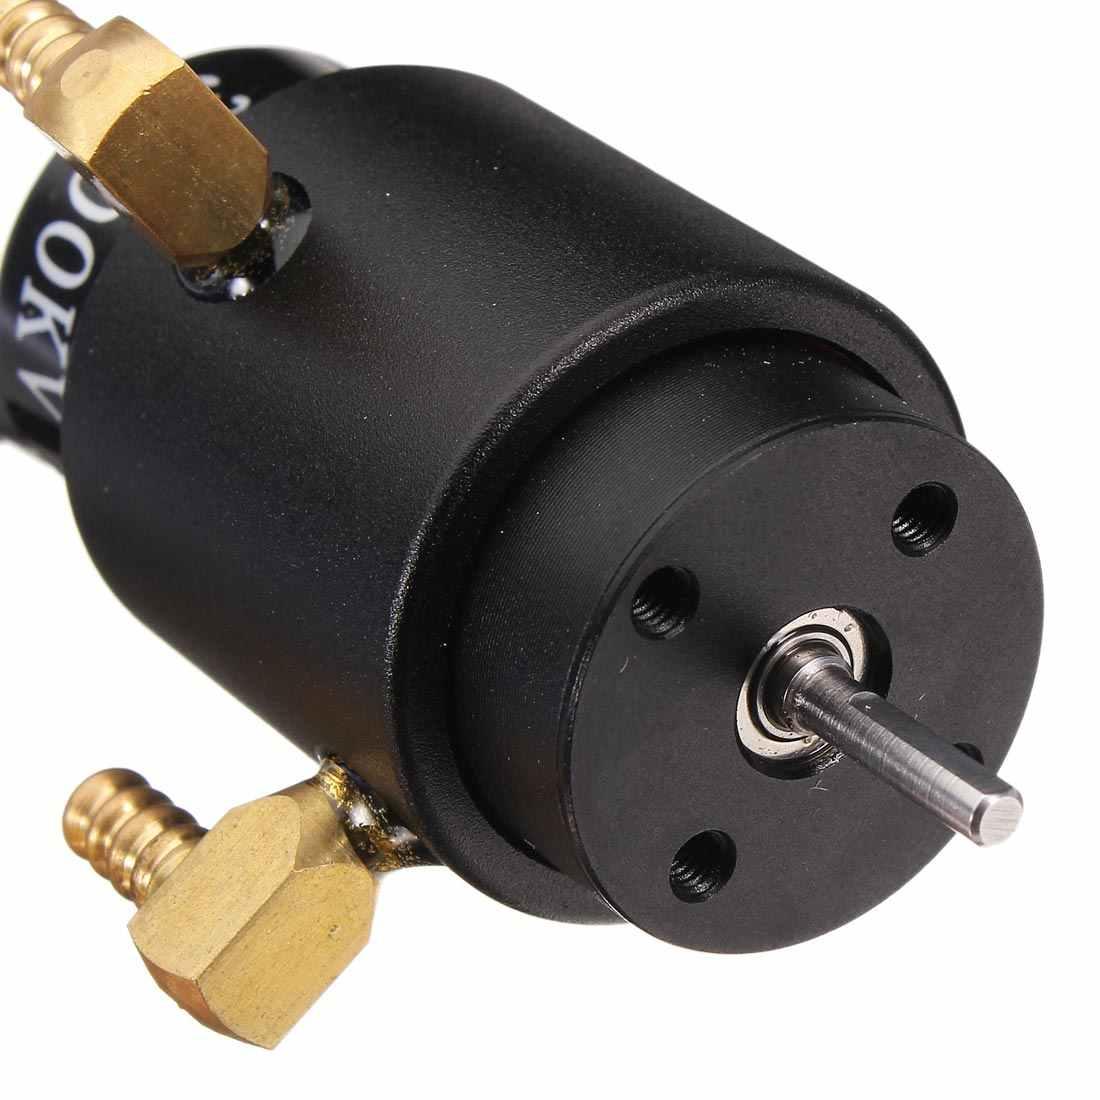 B2040 4000KV/3000KV Inrunner Motor sin escobillas refrigerado por agua para barco Rc